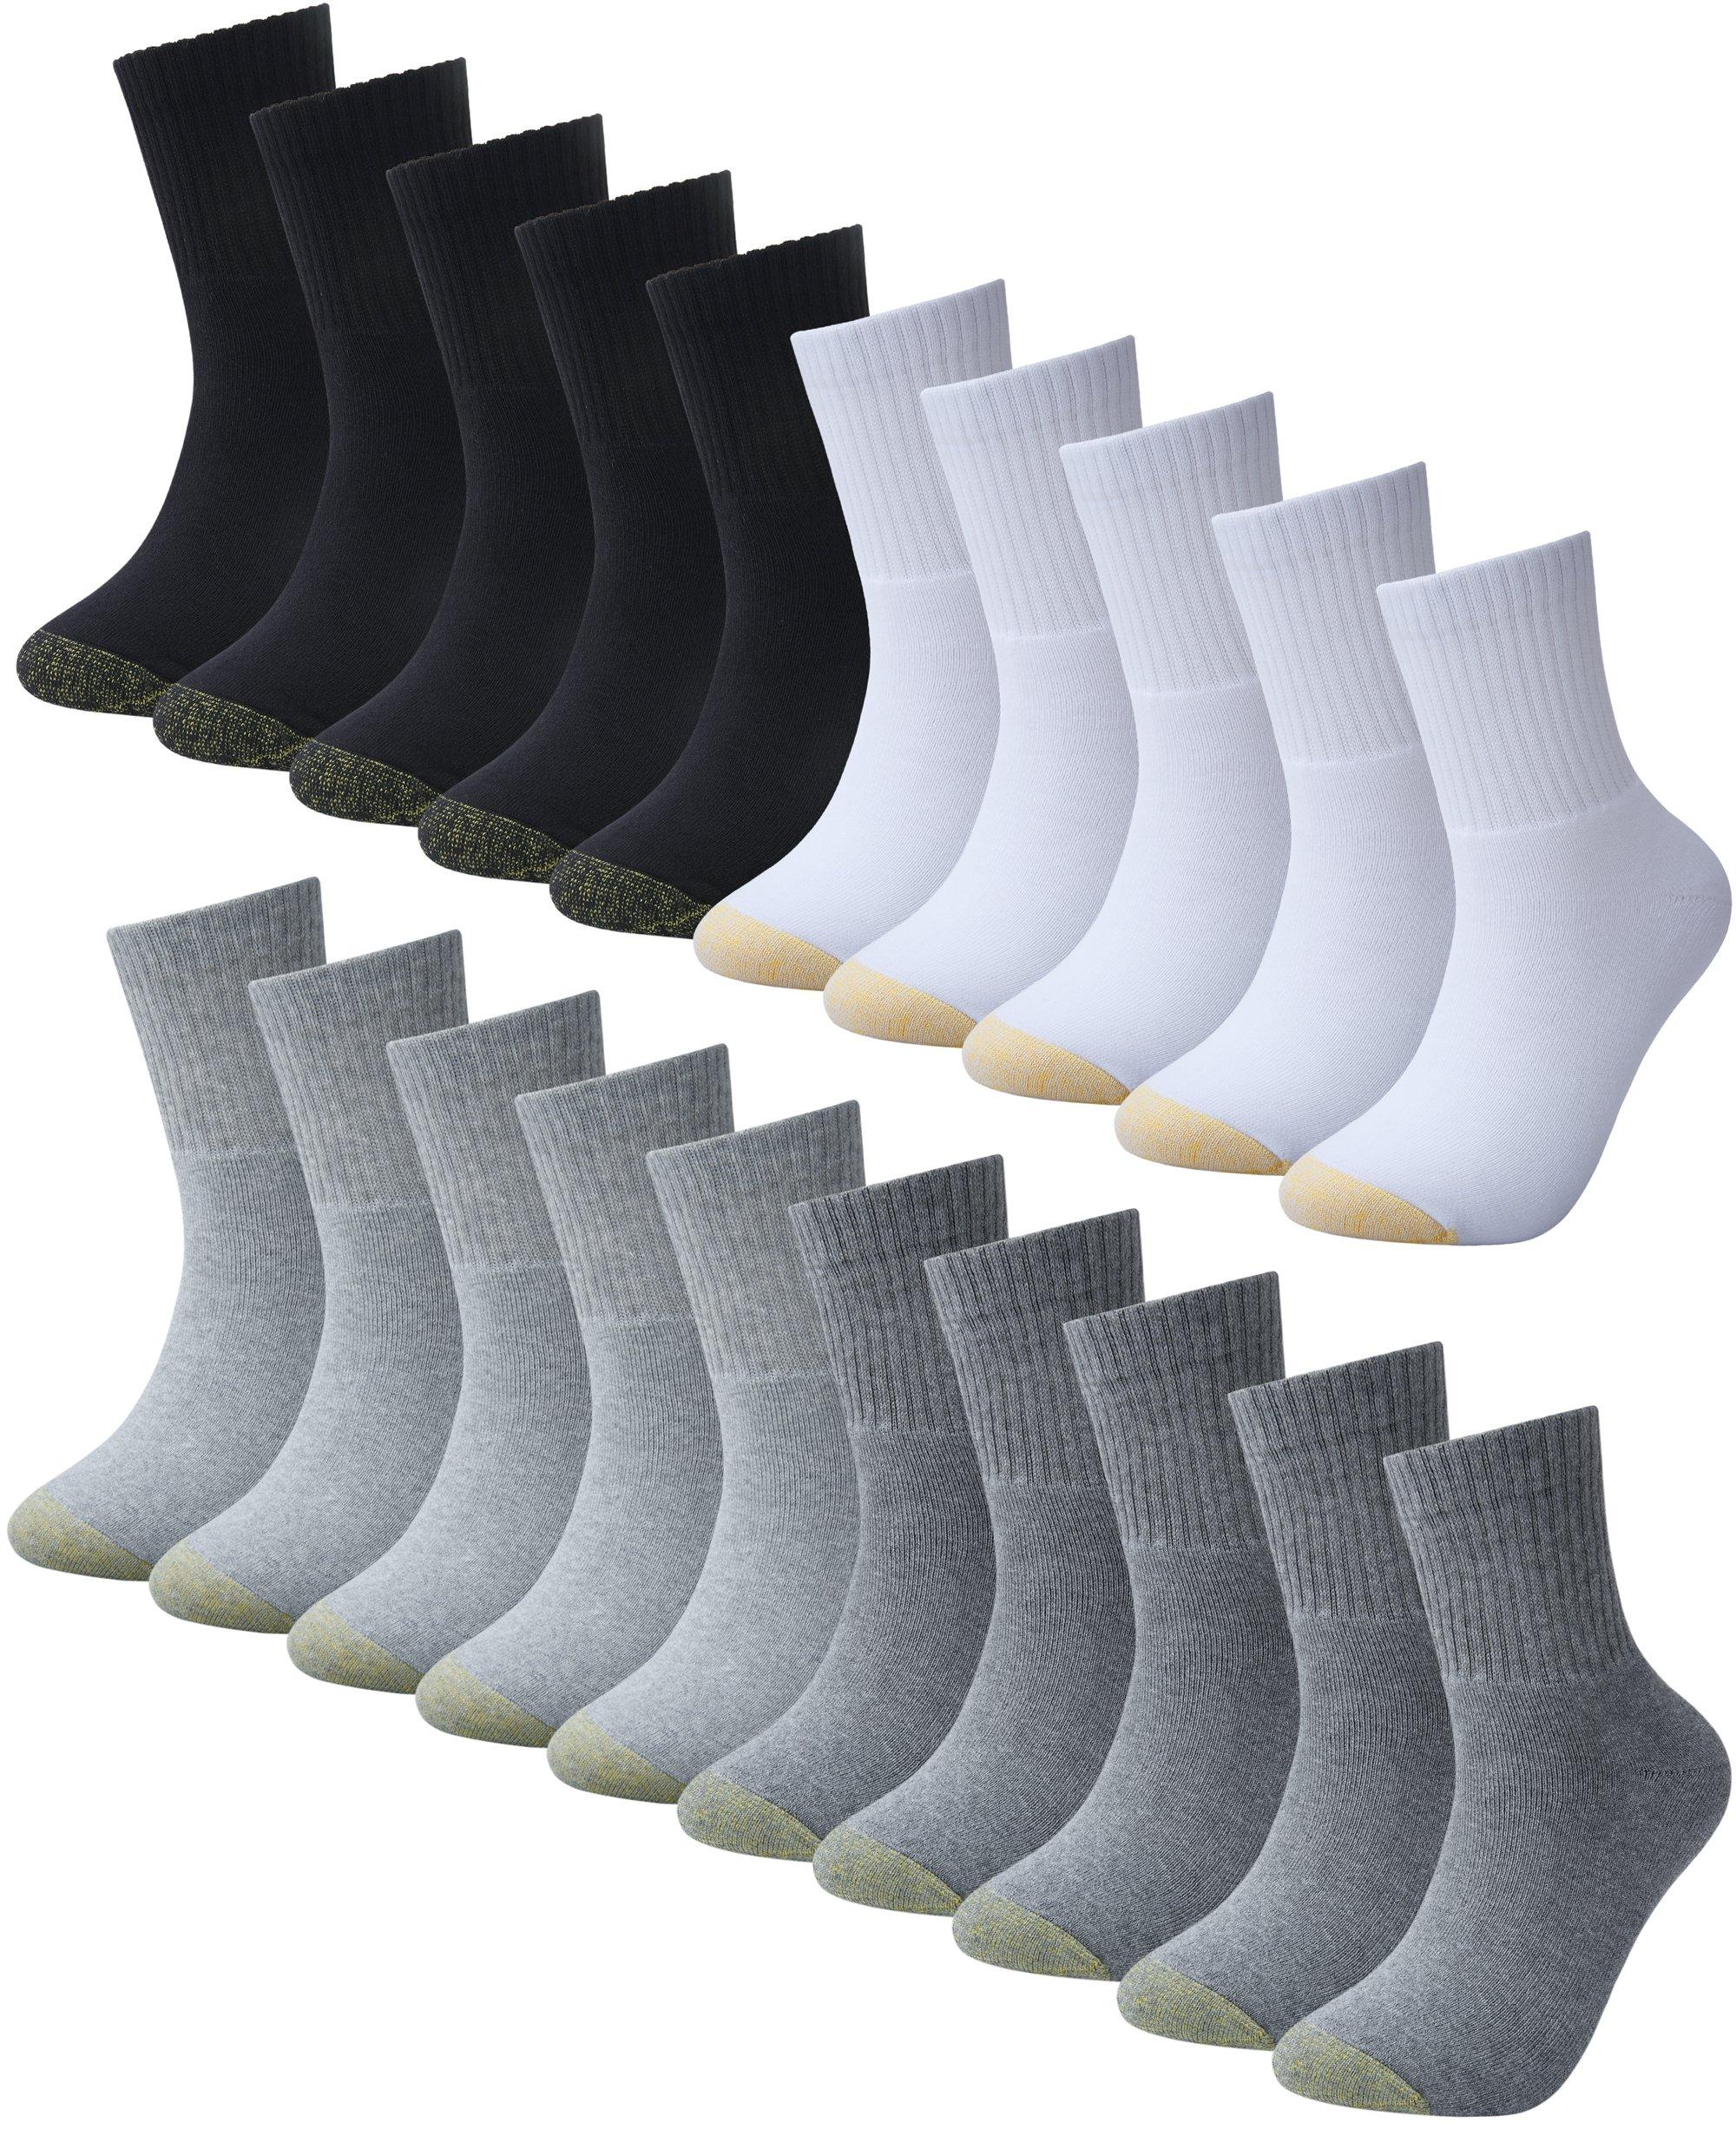 BAOMOSI Men's Premium Cotton Quarter Athletic Sock Moisture Wicking Cushion Athletic Casual Socks 20-Pack Black White Deep Grey SliverGrey 6-11